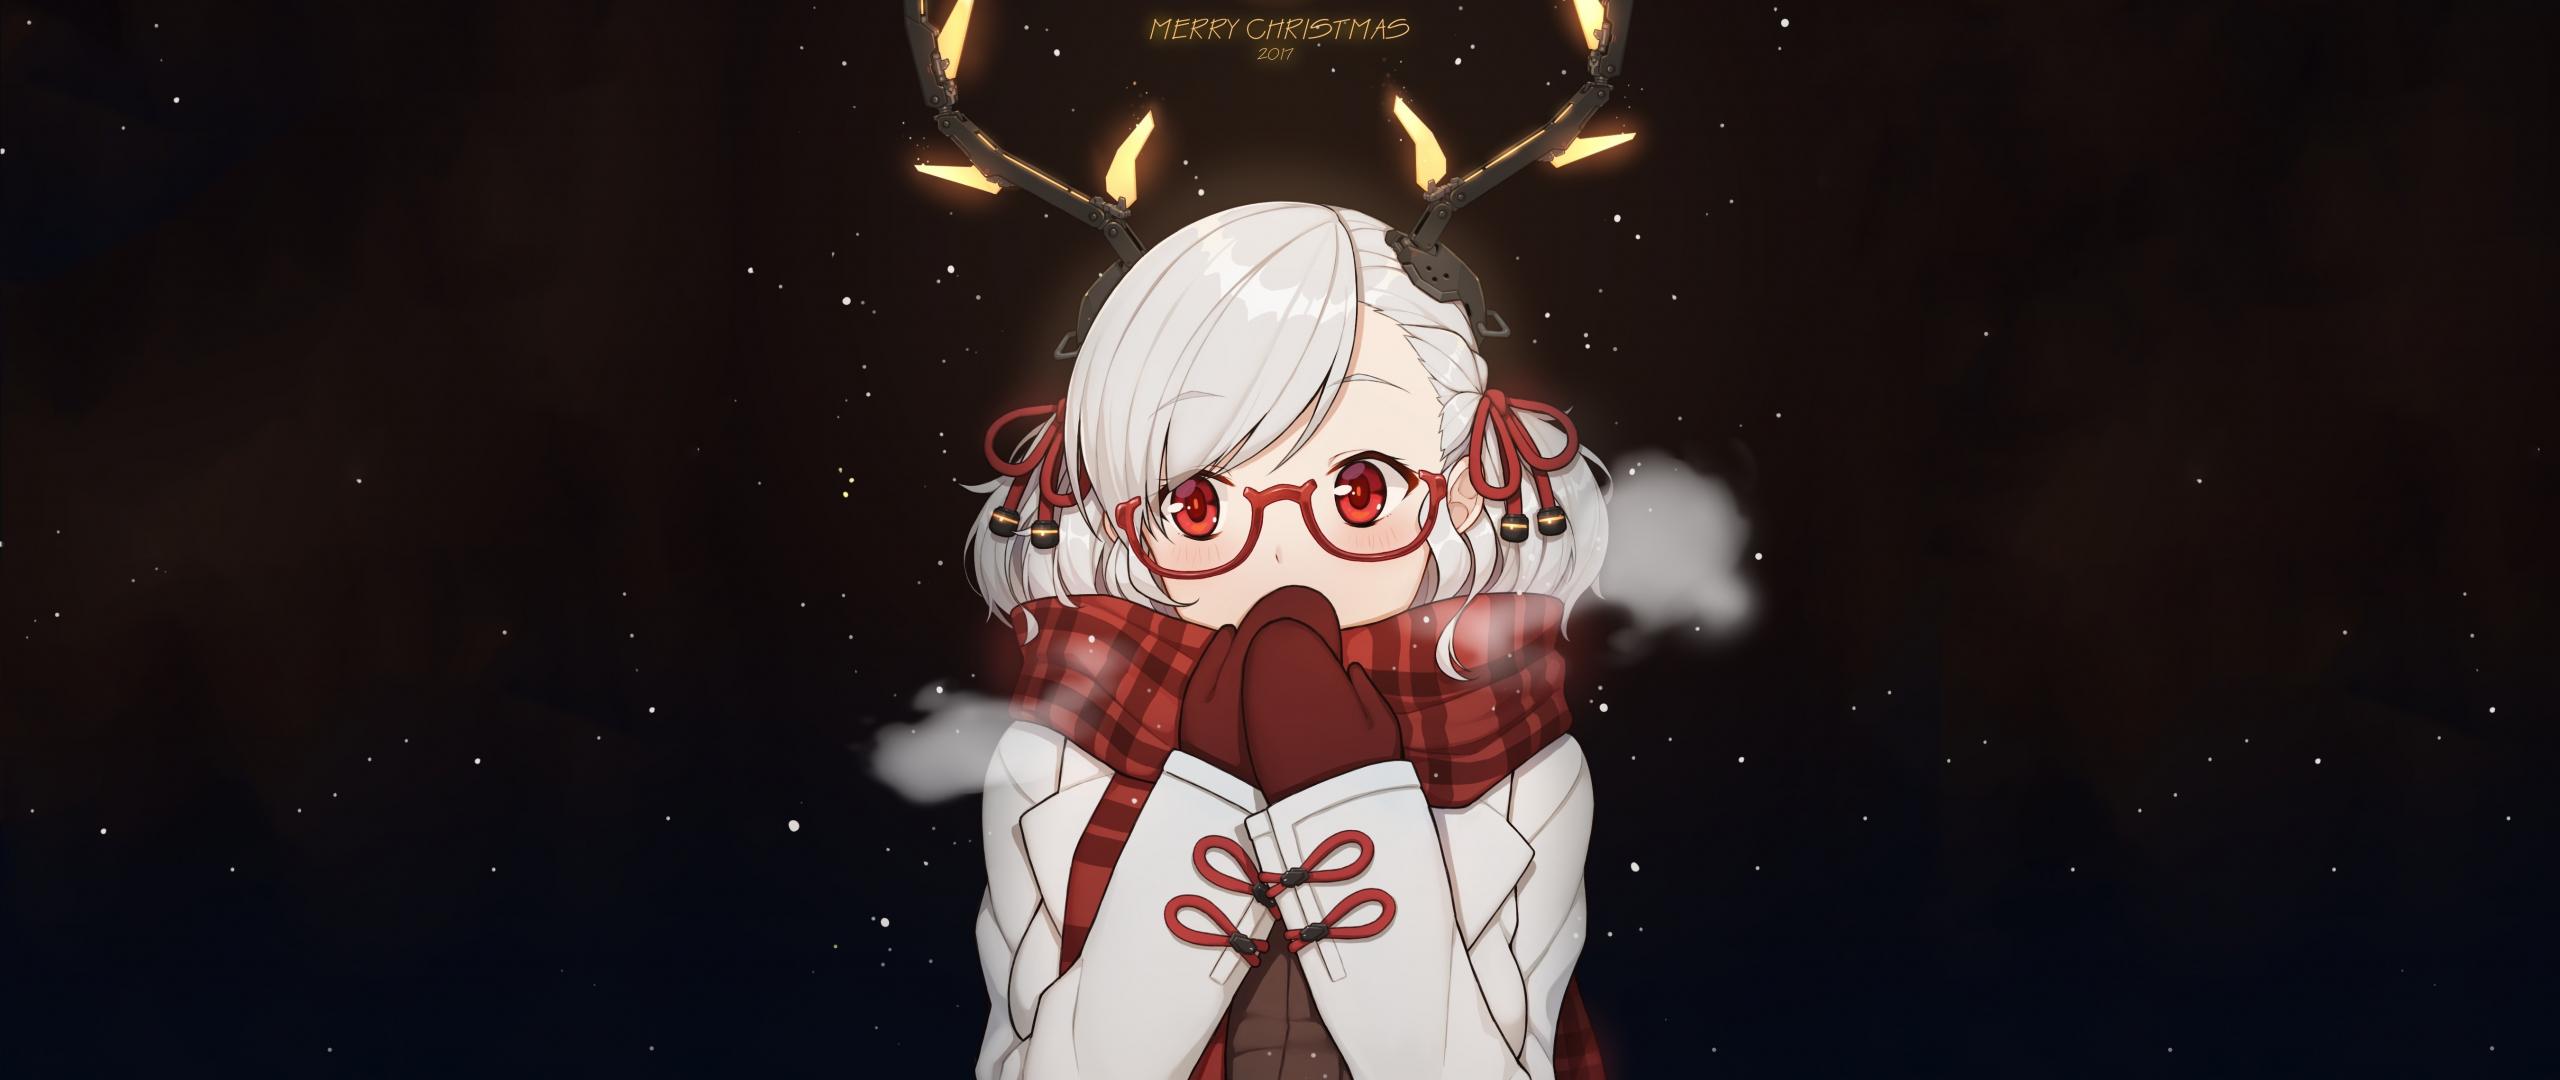 christmas horns girl anime original